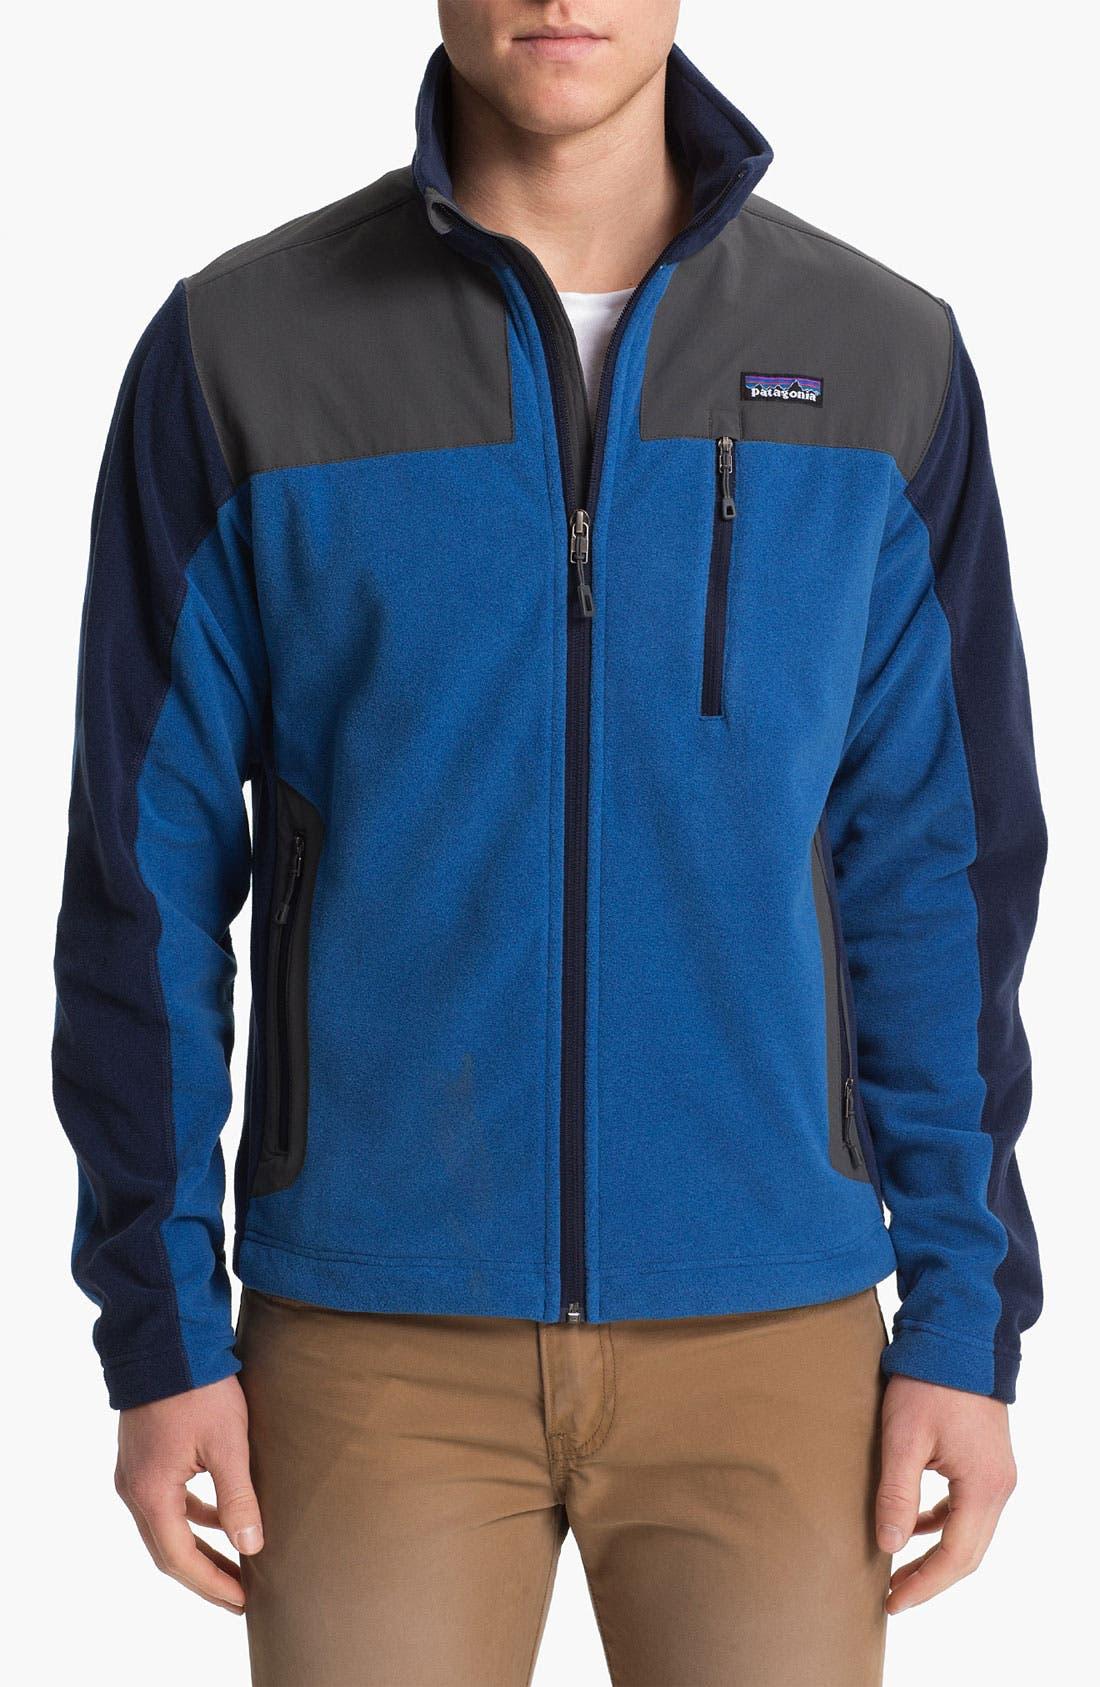 Main Image - Patagonia 'Cedars' Zip Fleece Jacket